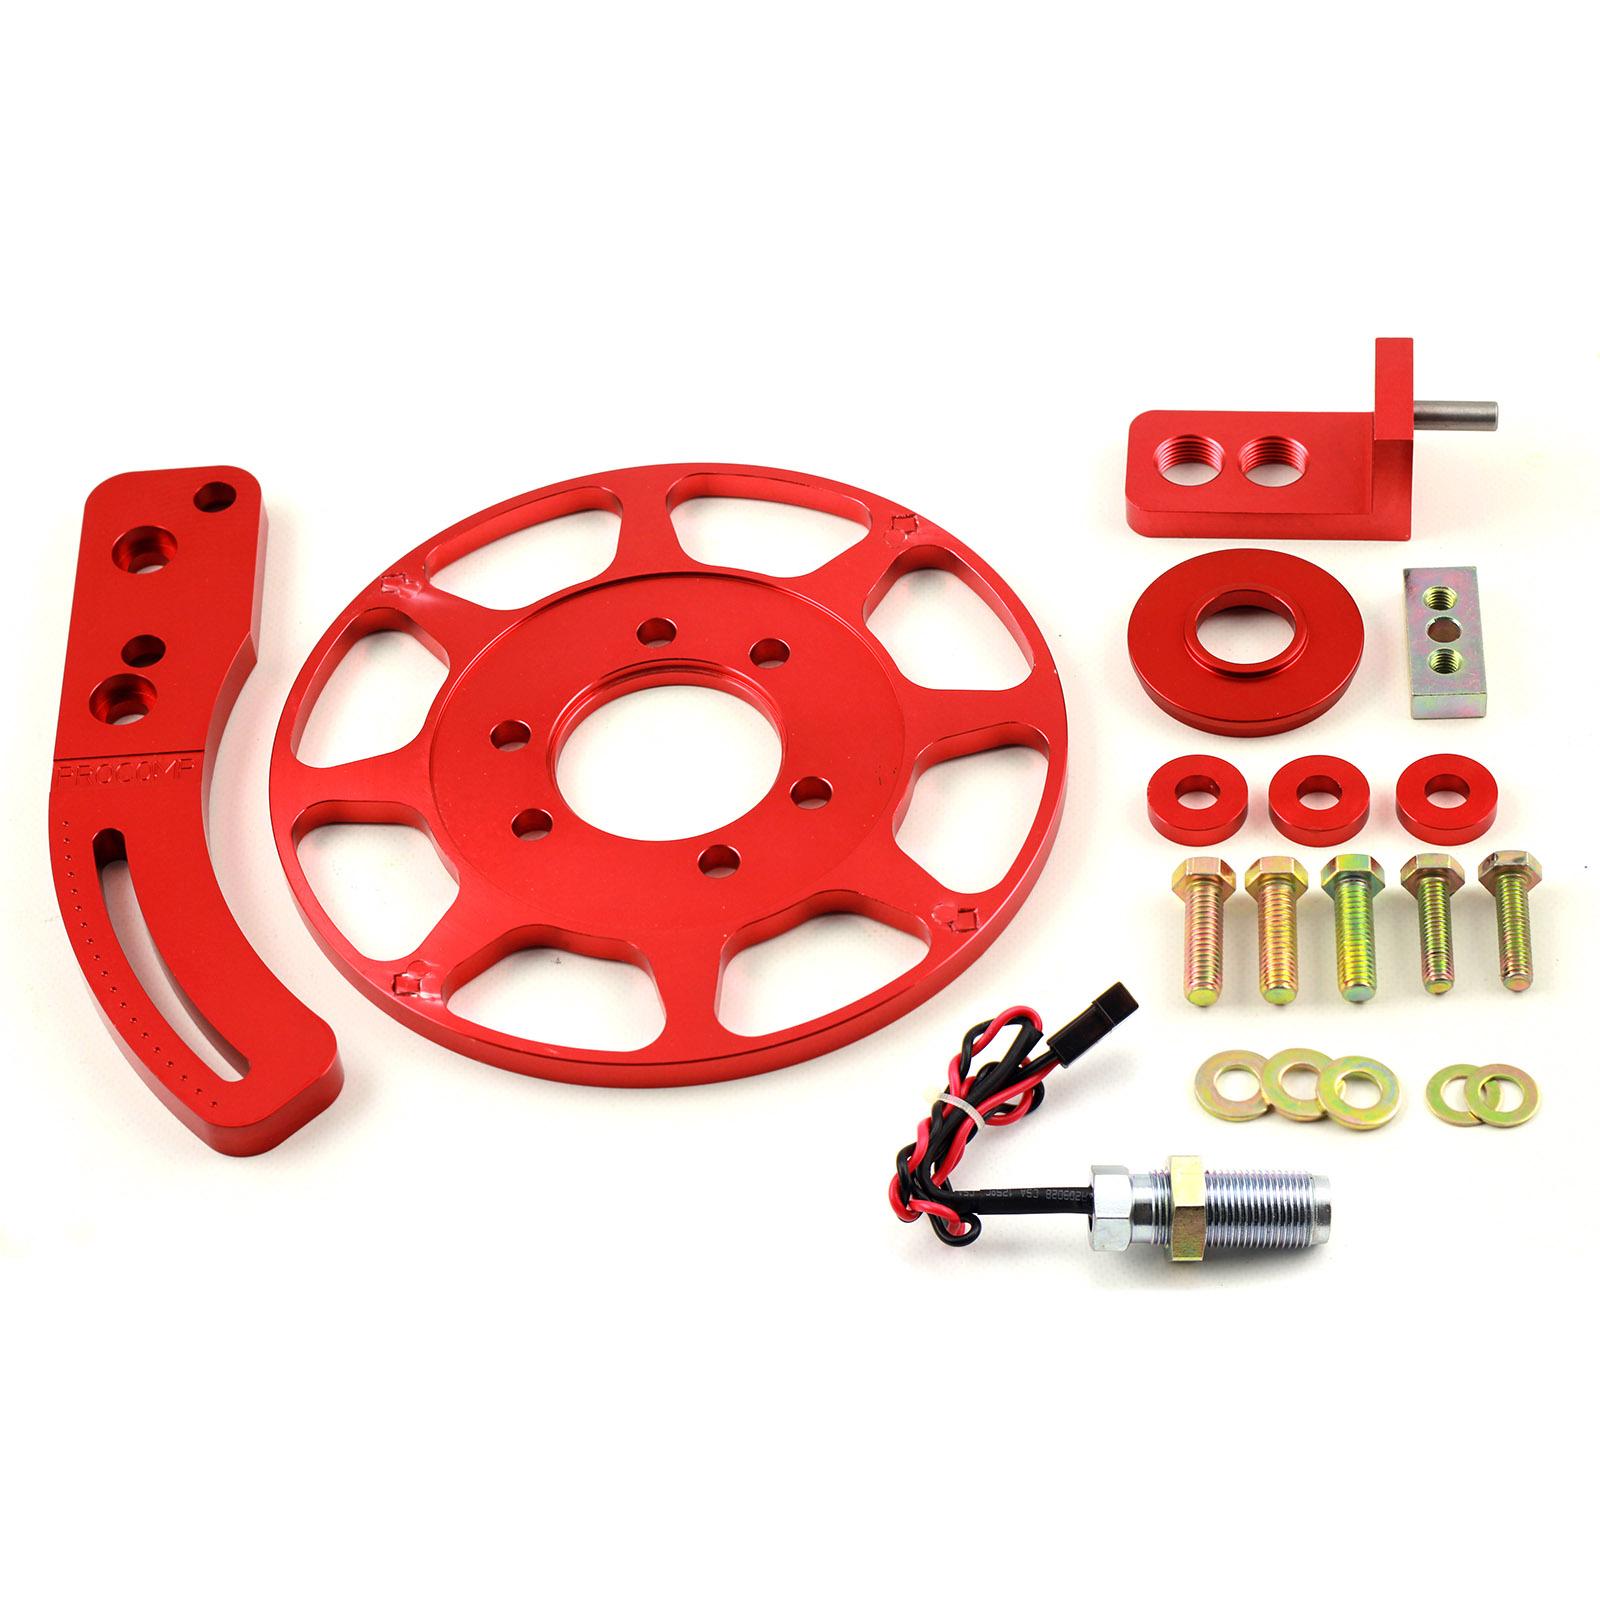 Speedmaster PCE376.1168 Crank Trigger Distributors